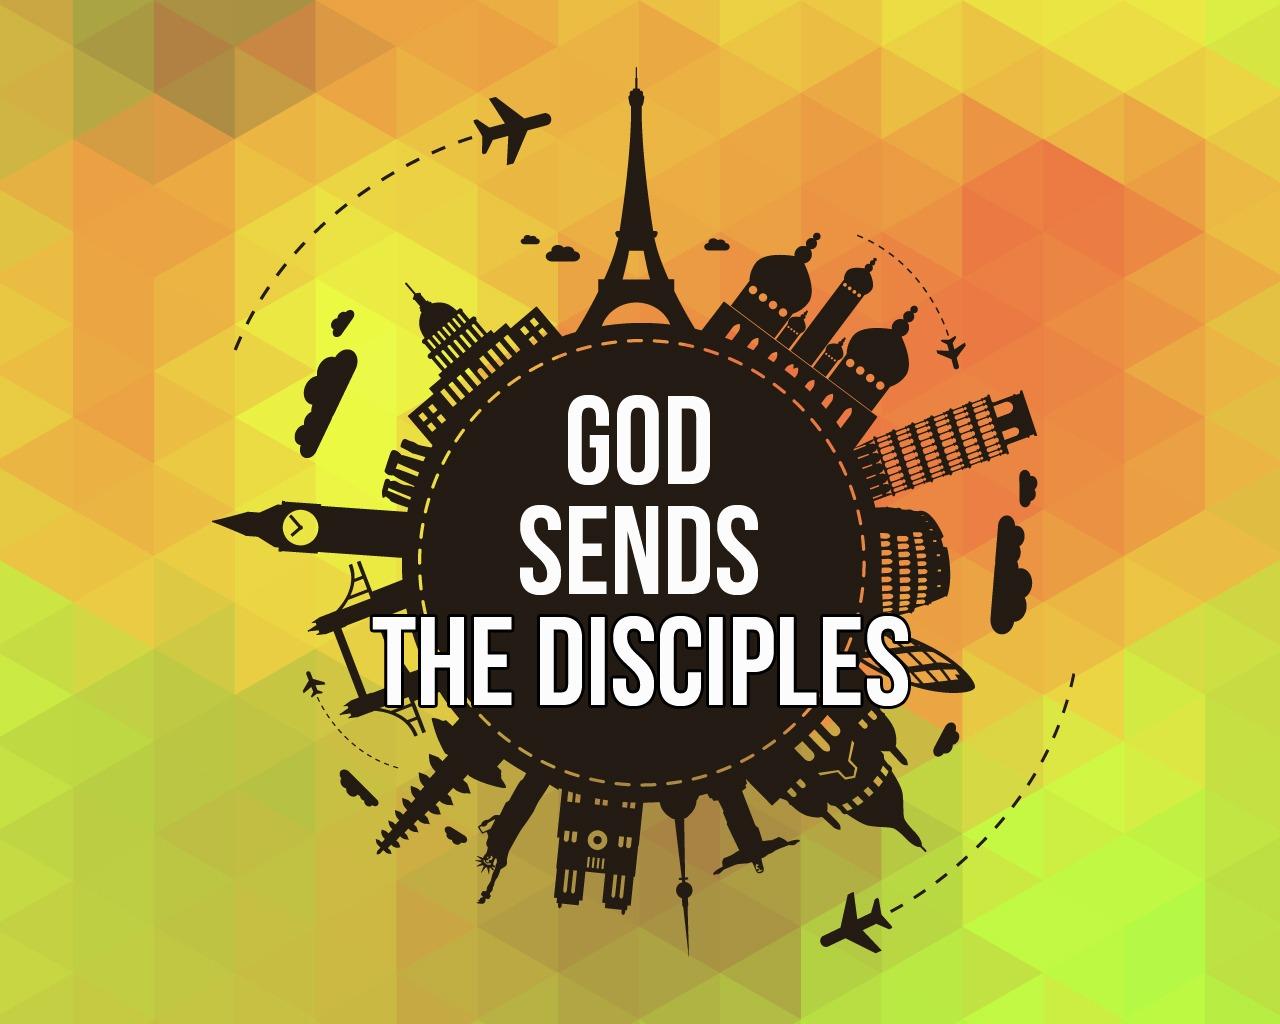 'God Sends The Disciples' Sunday School Lesson (Matthew 28:16-20)